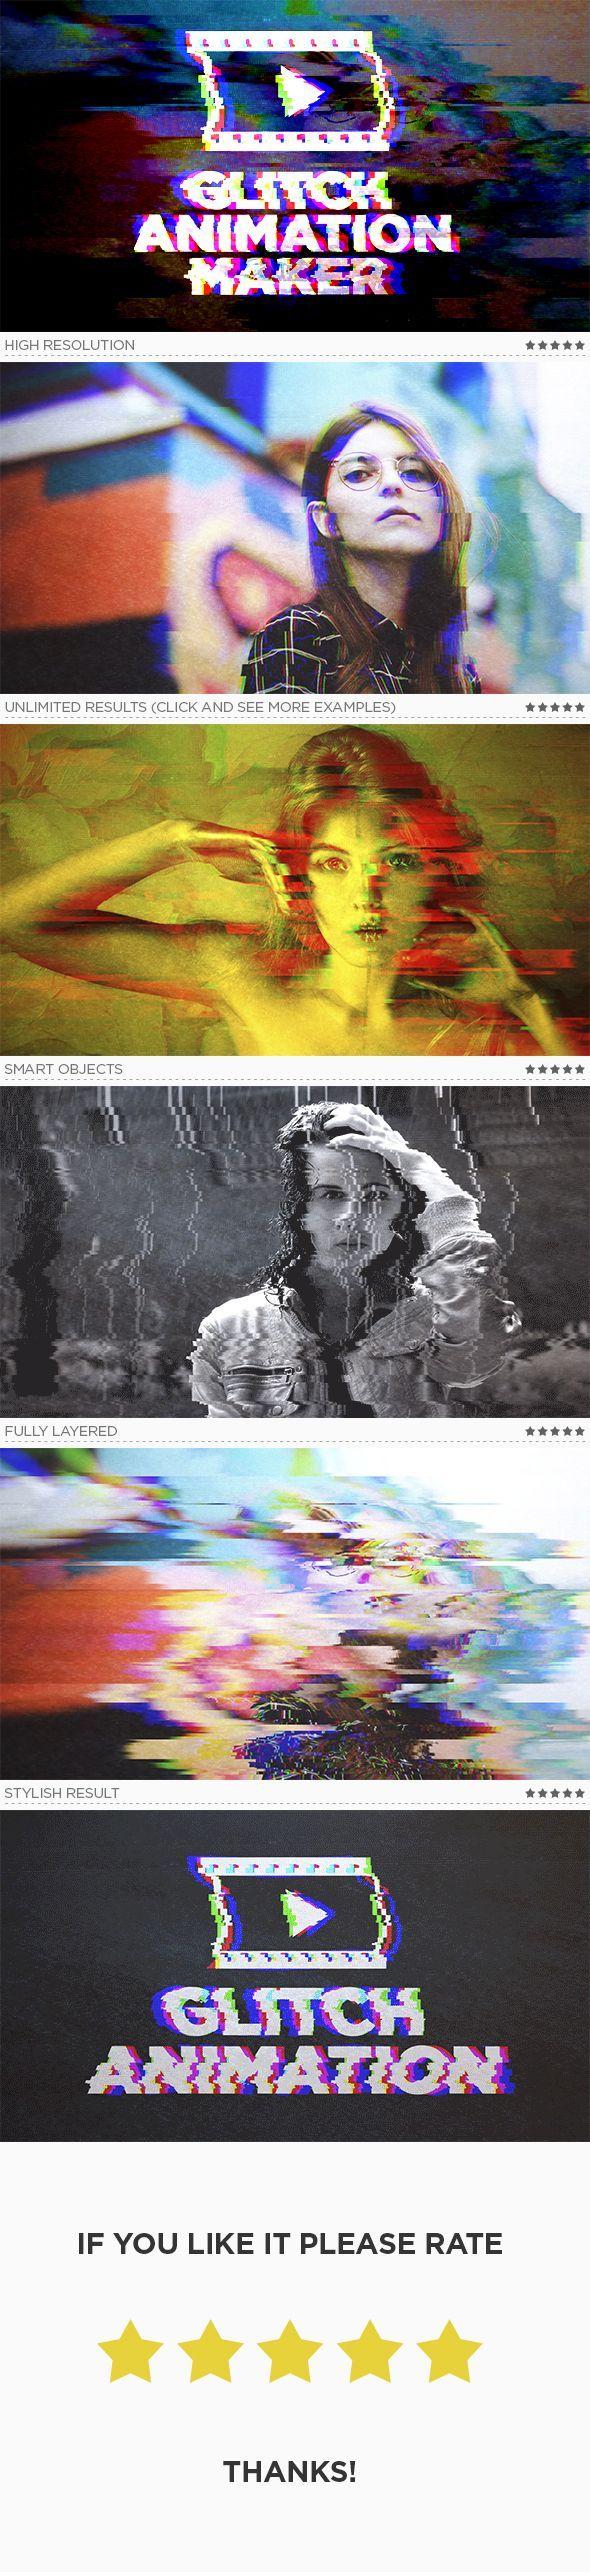 Glitch Animation Maker Photoshop Action